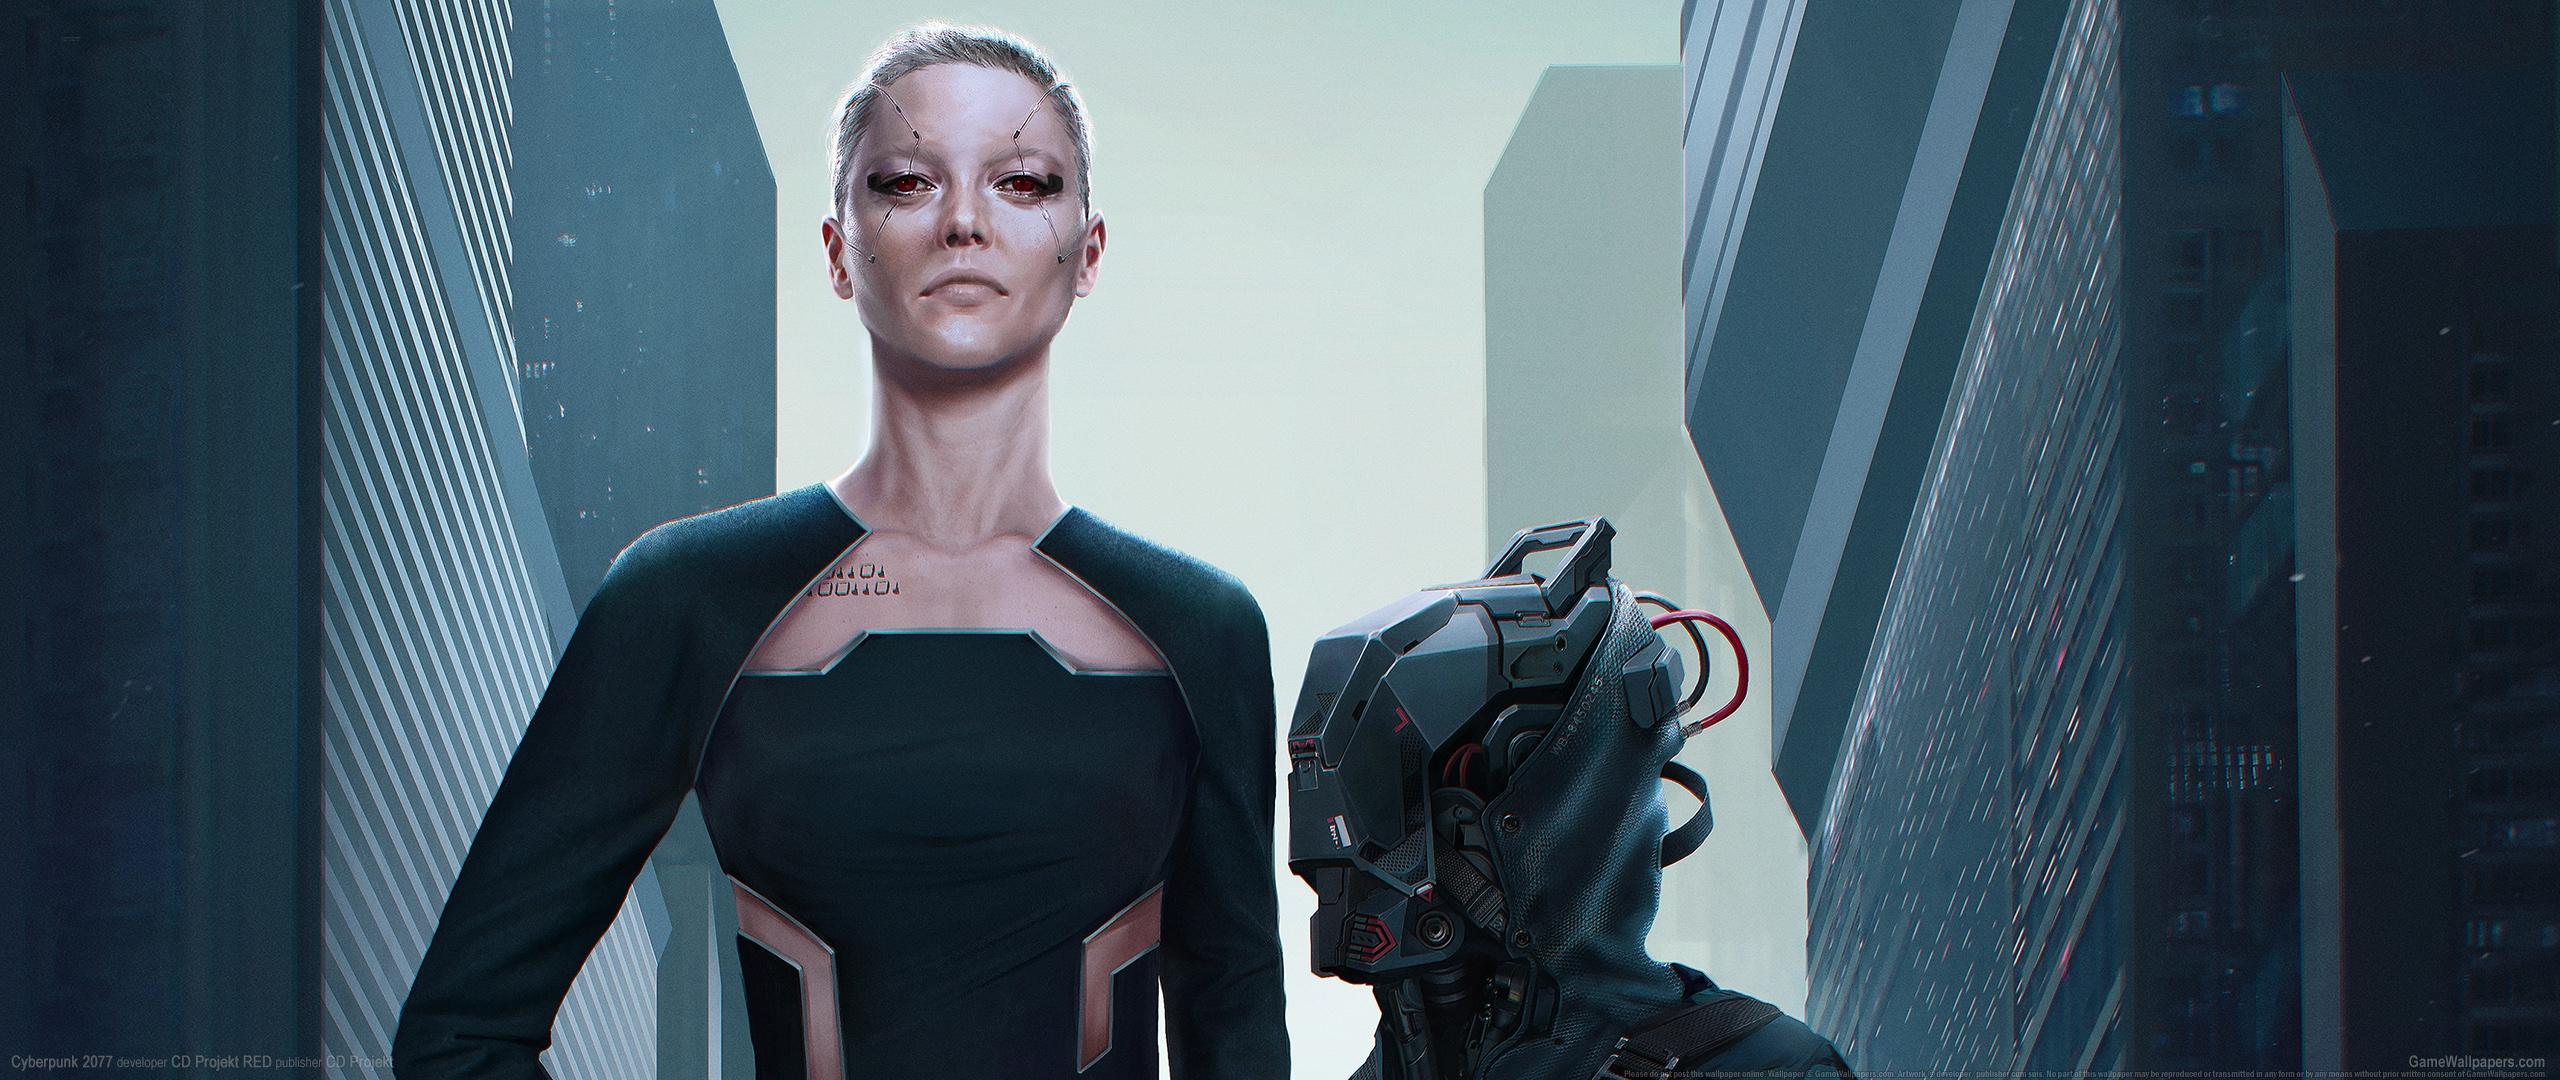 Cyberpunk 2077 2560x1080 fond d'écran 22